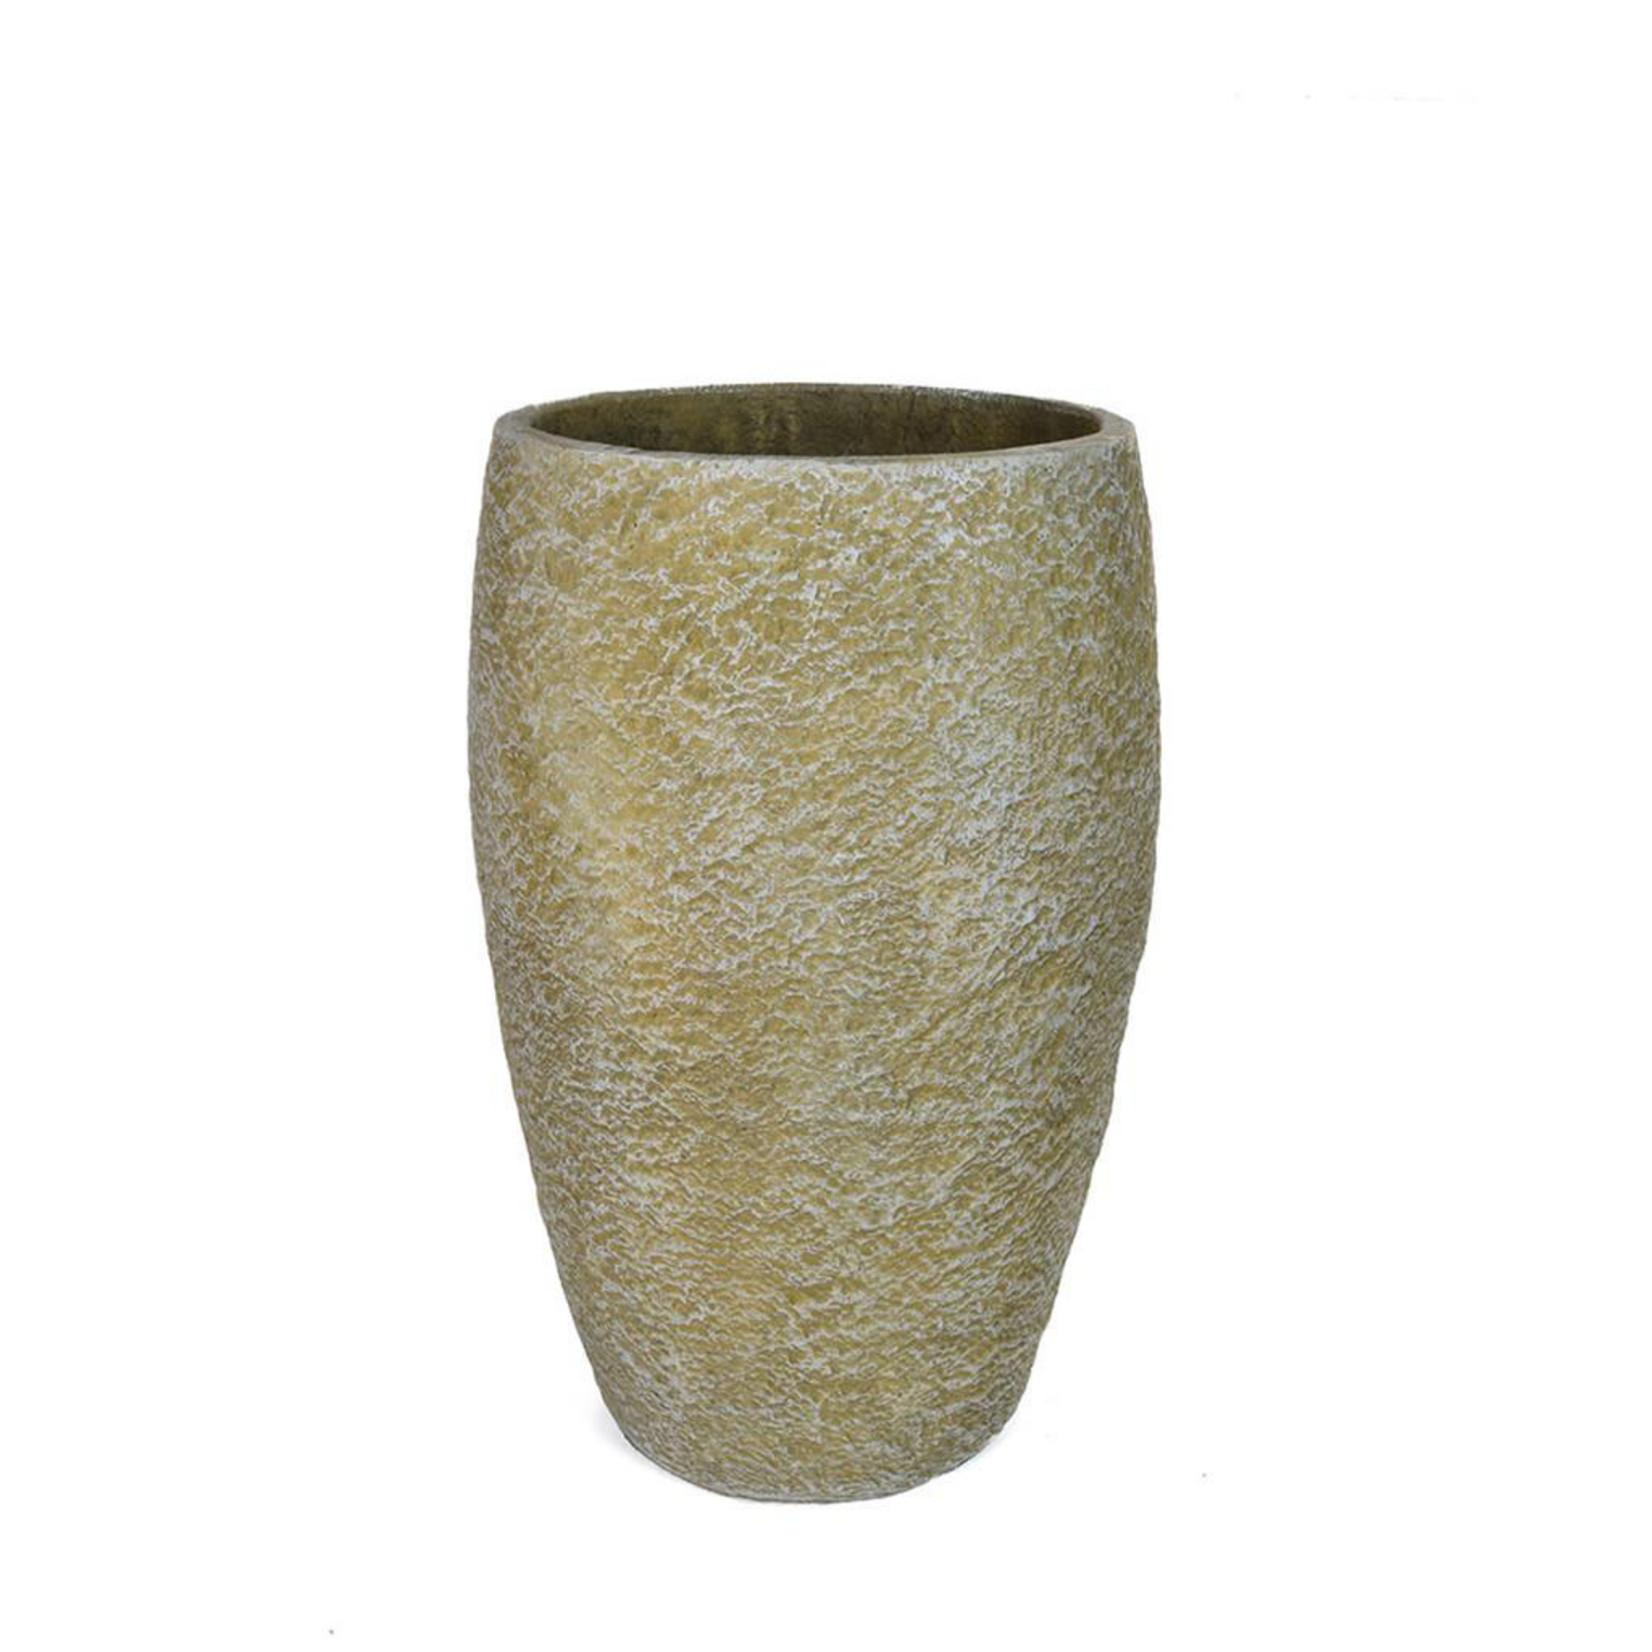 V-Pot Tall Rnd Granite Soil R 37x37x57cm